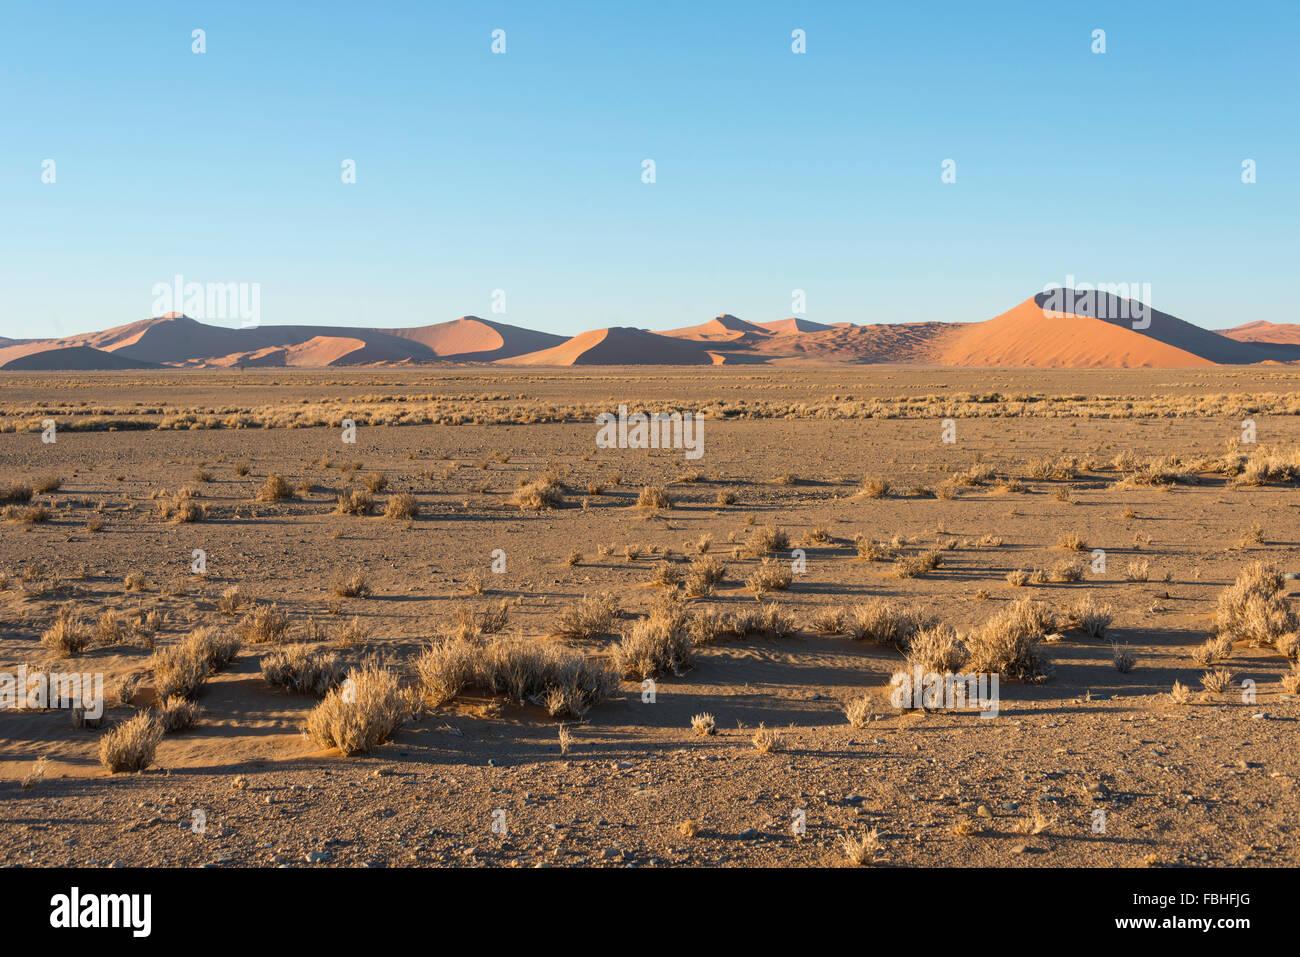 Desert scene, Namib Naukluft Park, Namib Desert, Republic of Namibia - Stock Image